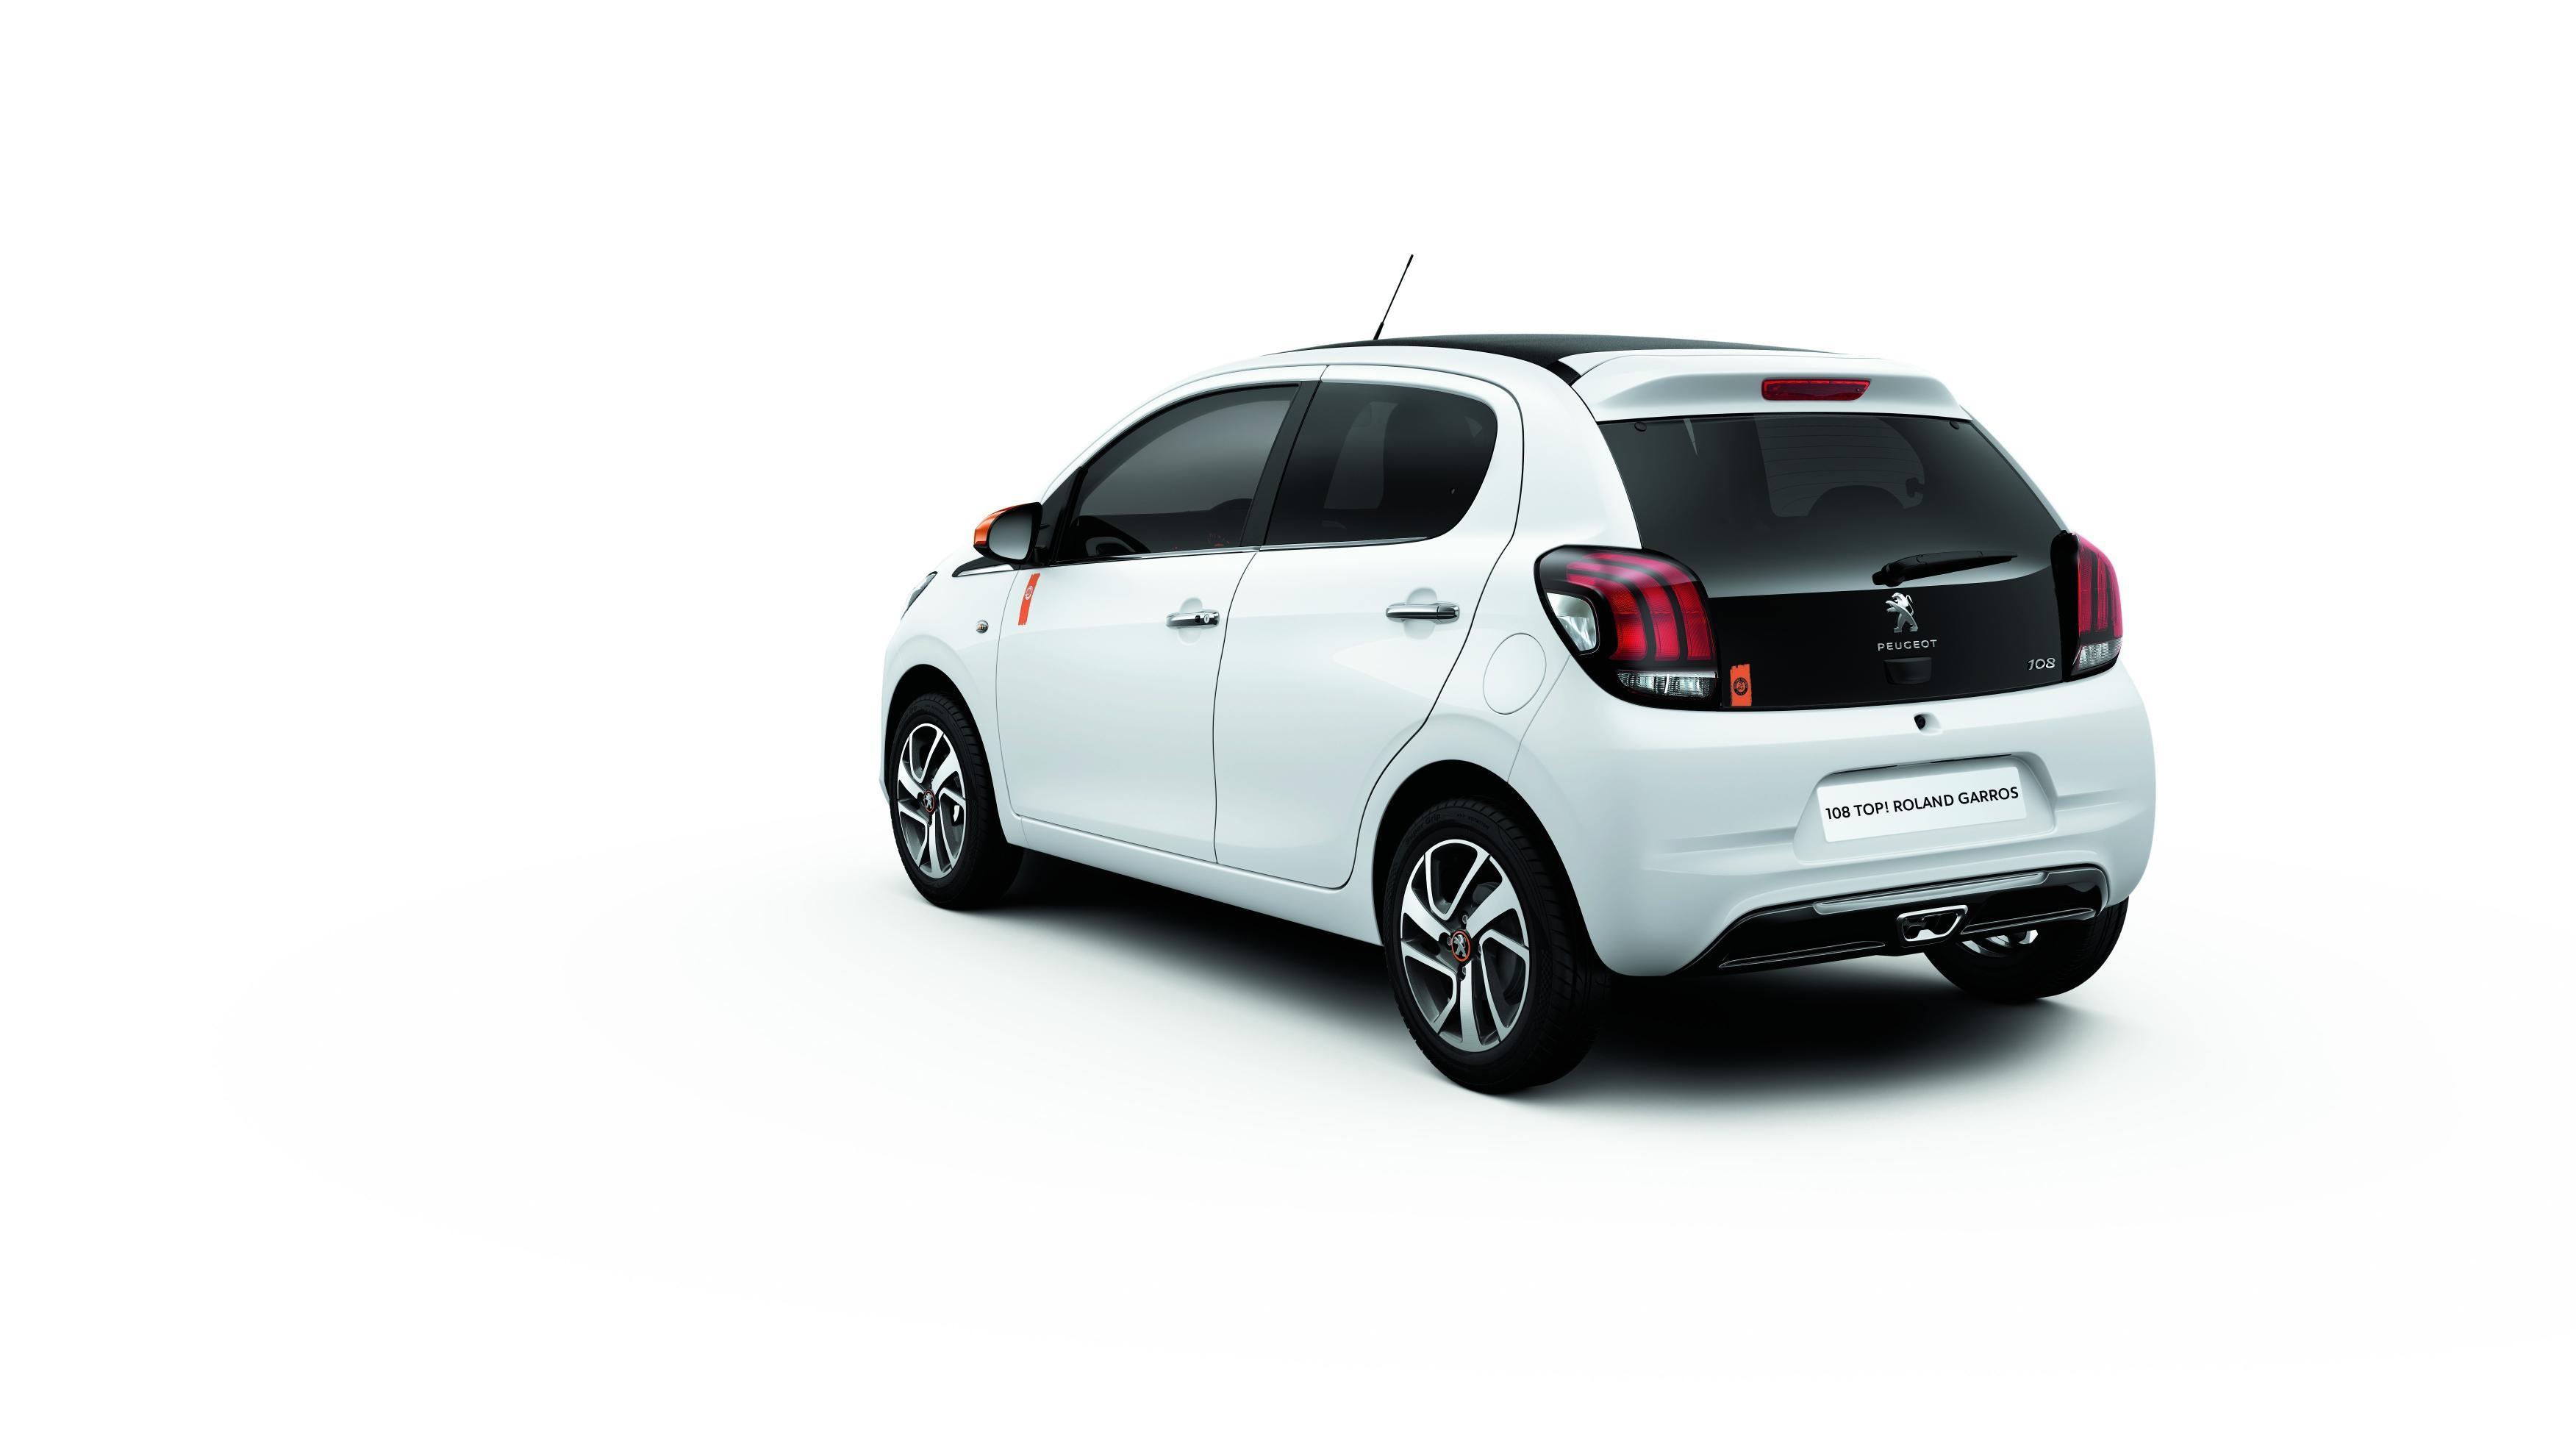 Kingdom Auto Sales >> Peugeot 108 Roland Garros Special Edition is the ...